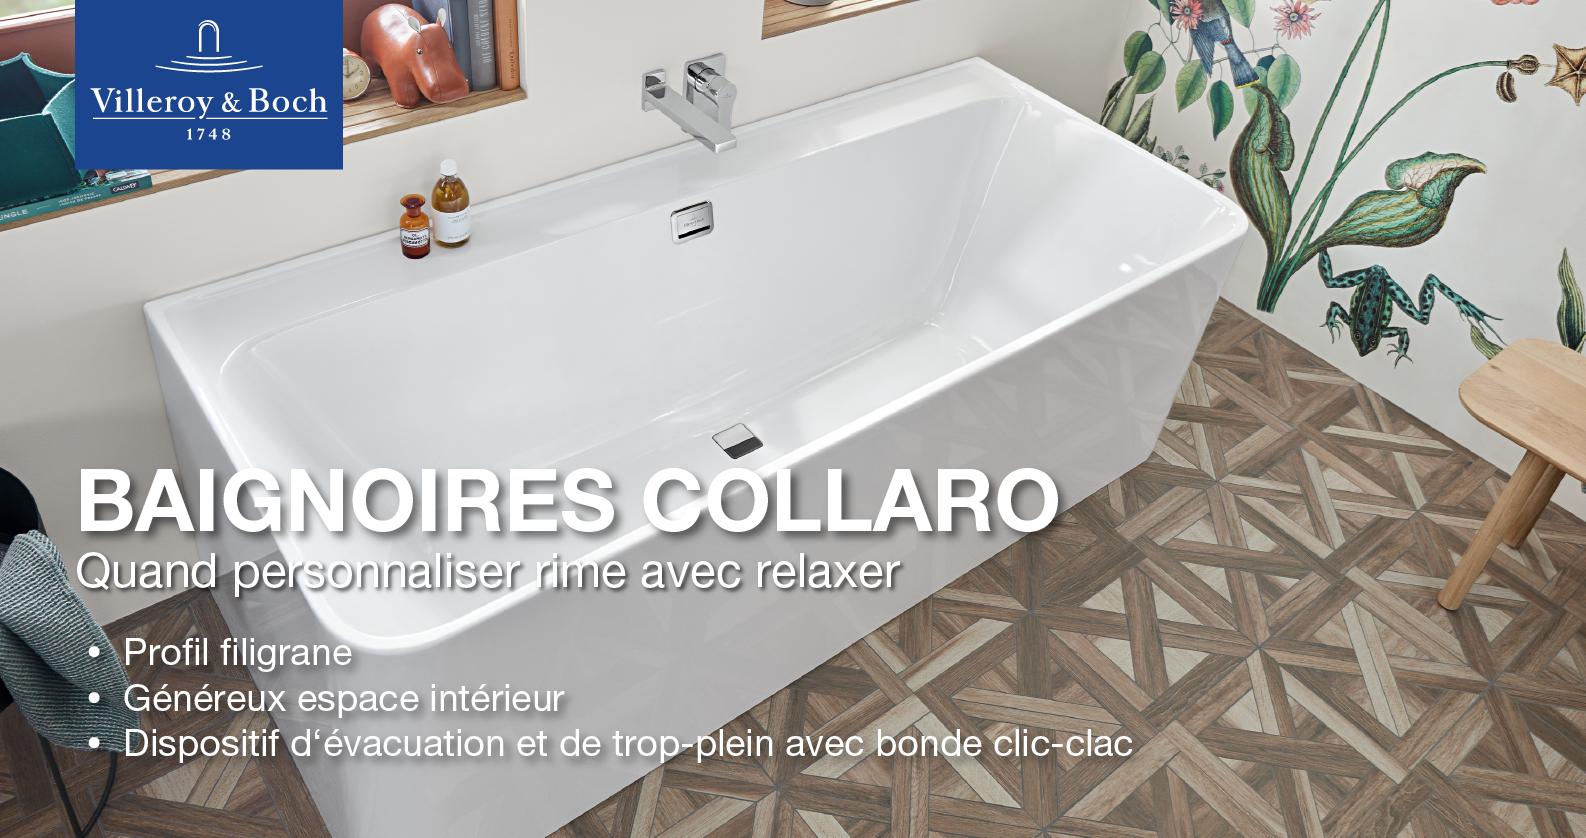 Villeroy & Boch Collaror Baignoires